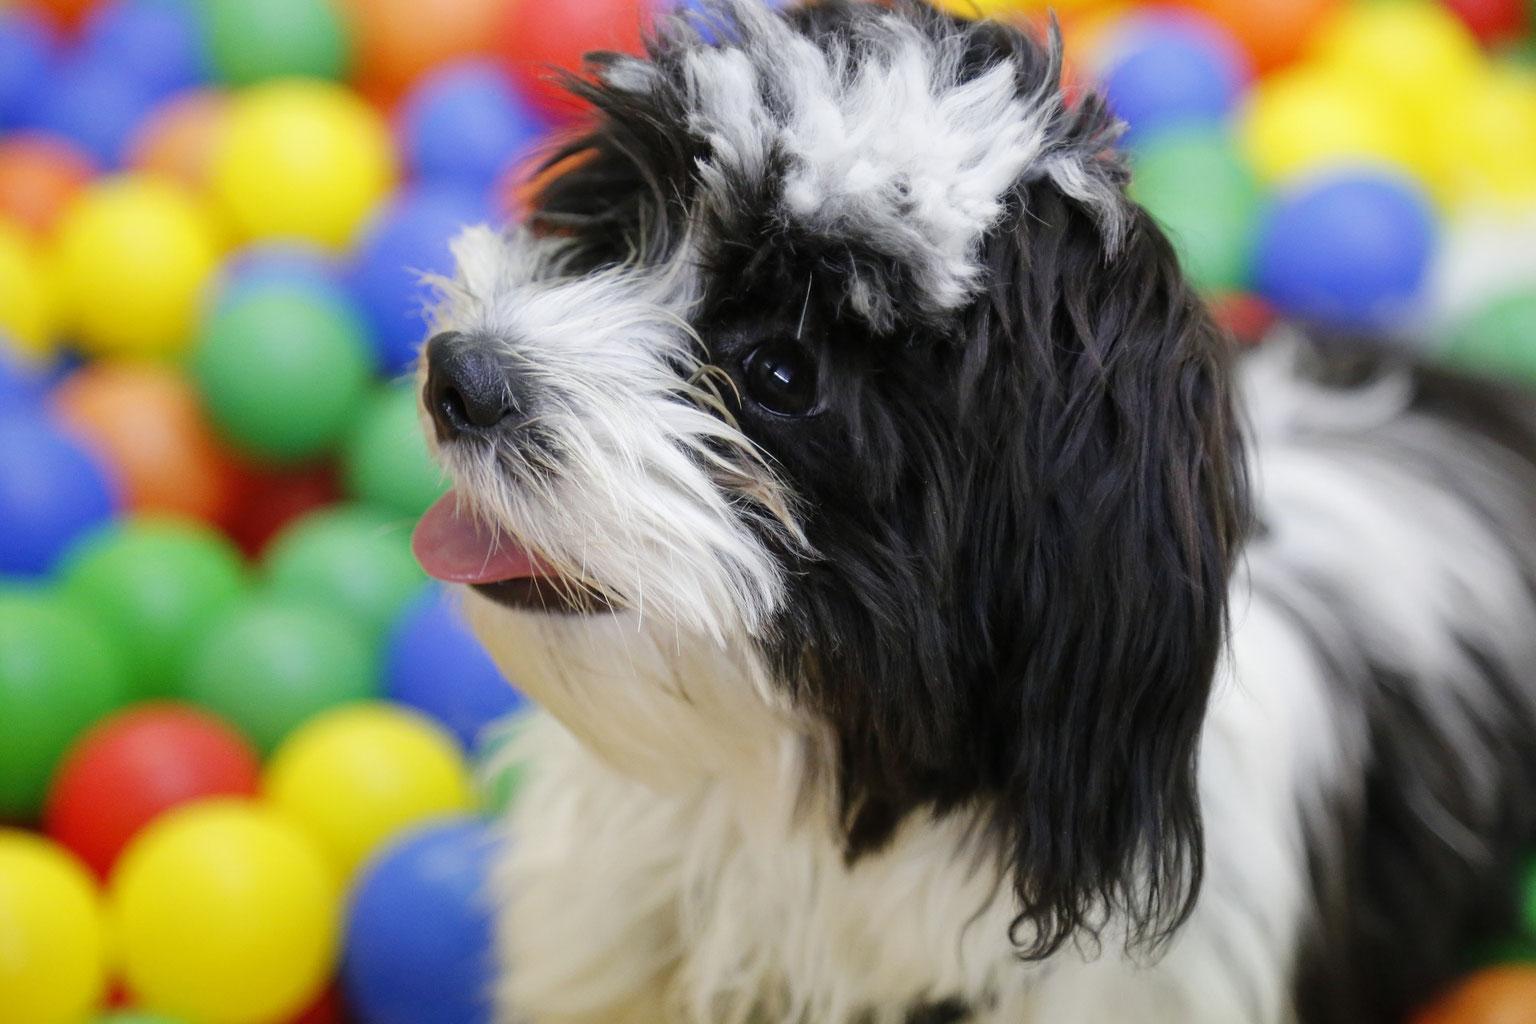 Leistenbruch Hund Bilder - The Ikea Table Tops